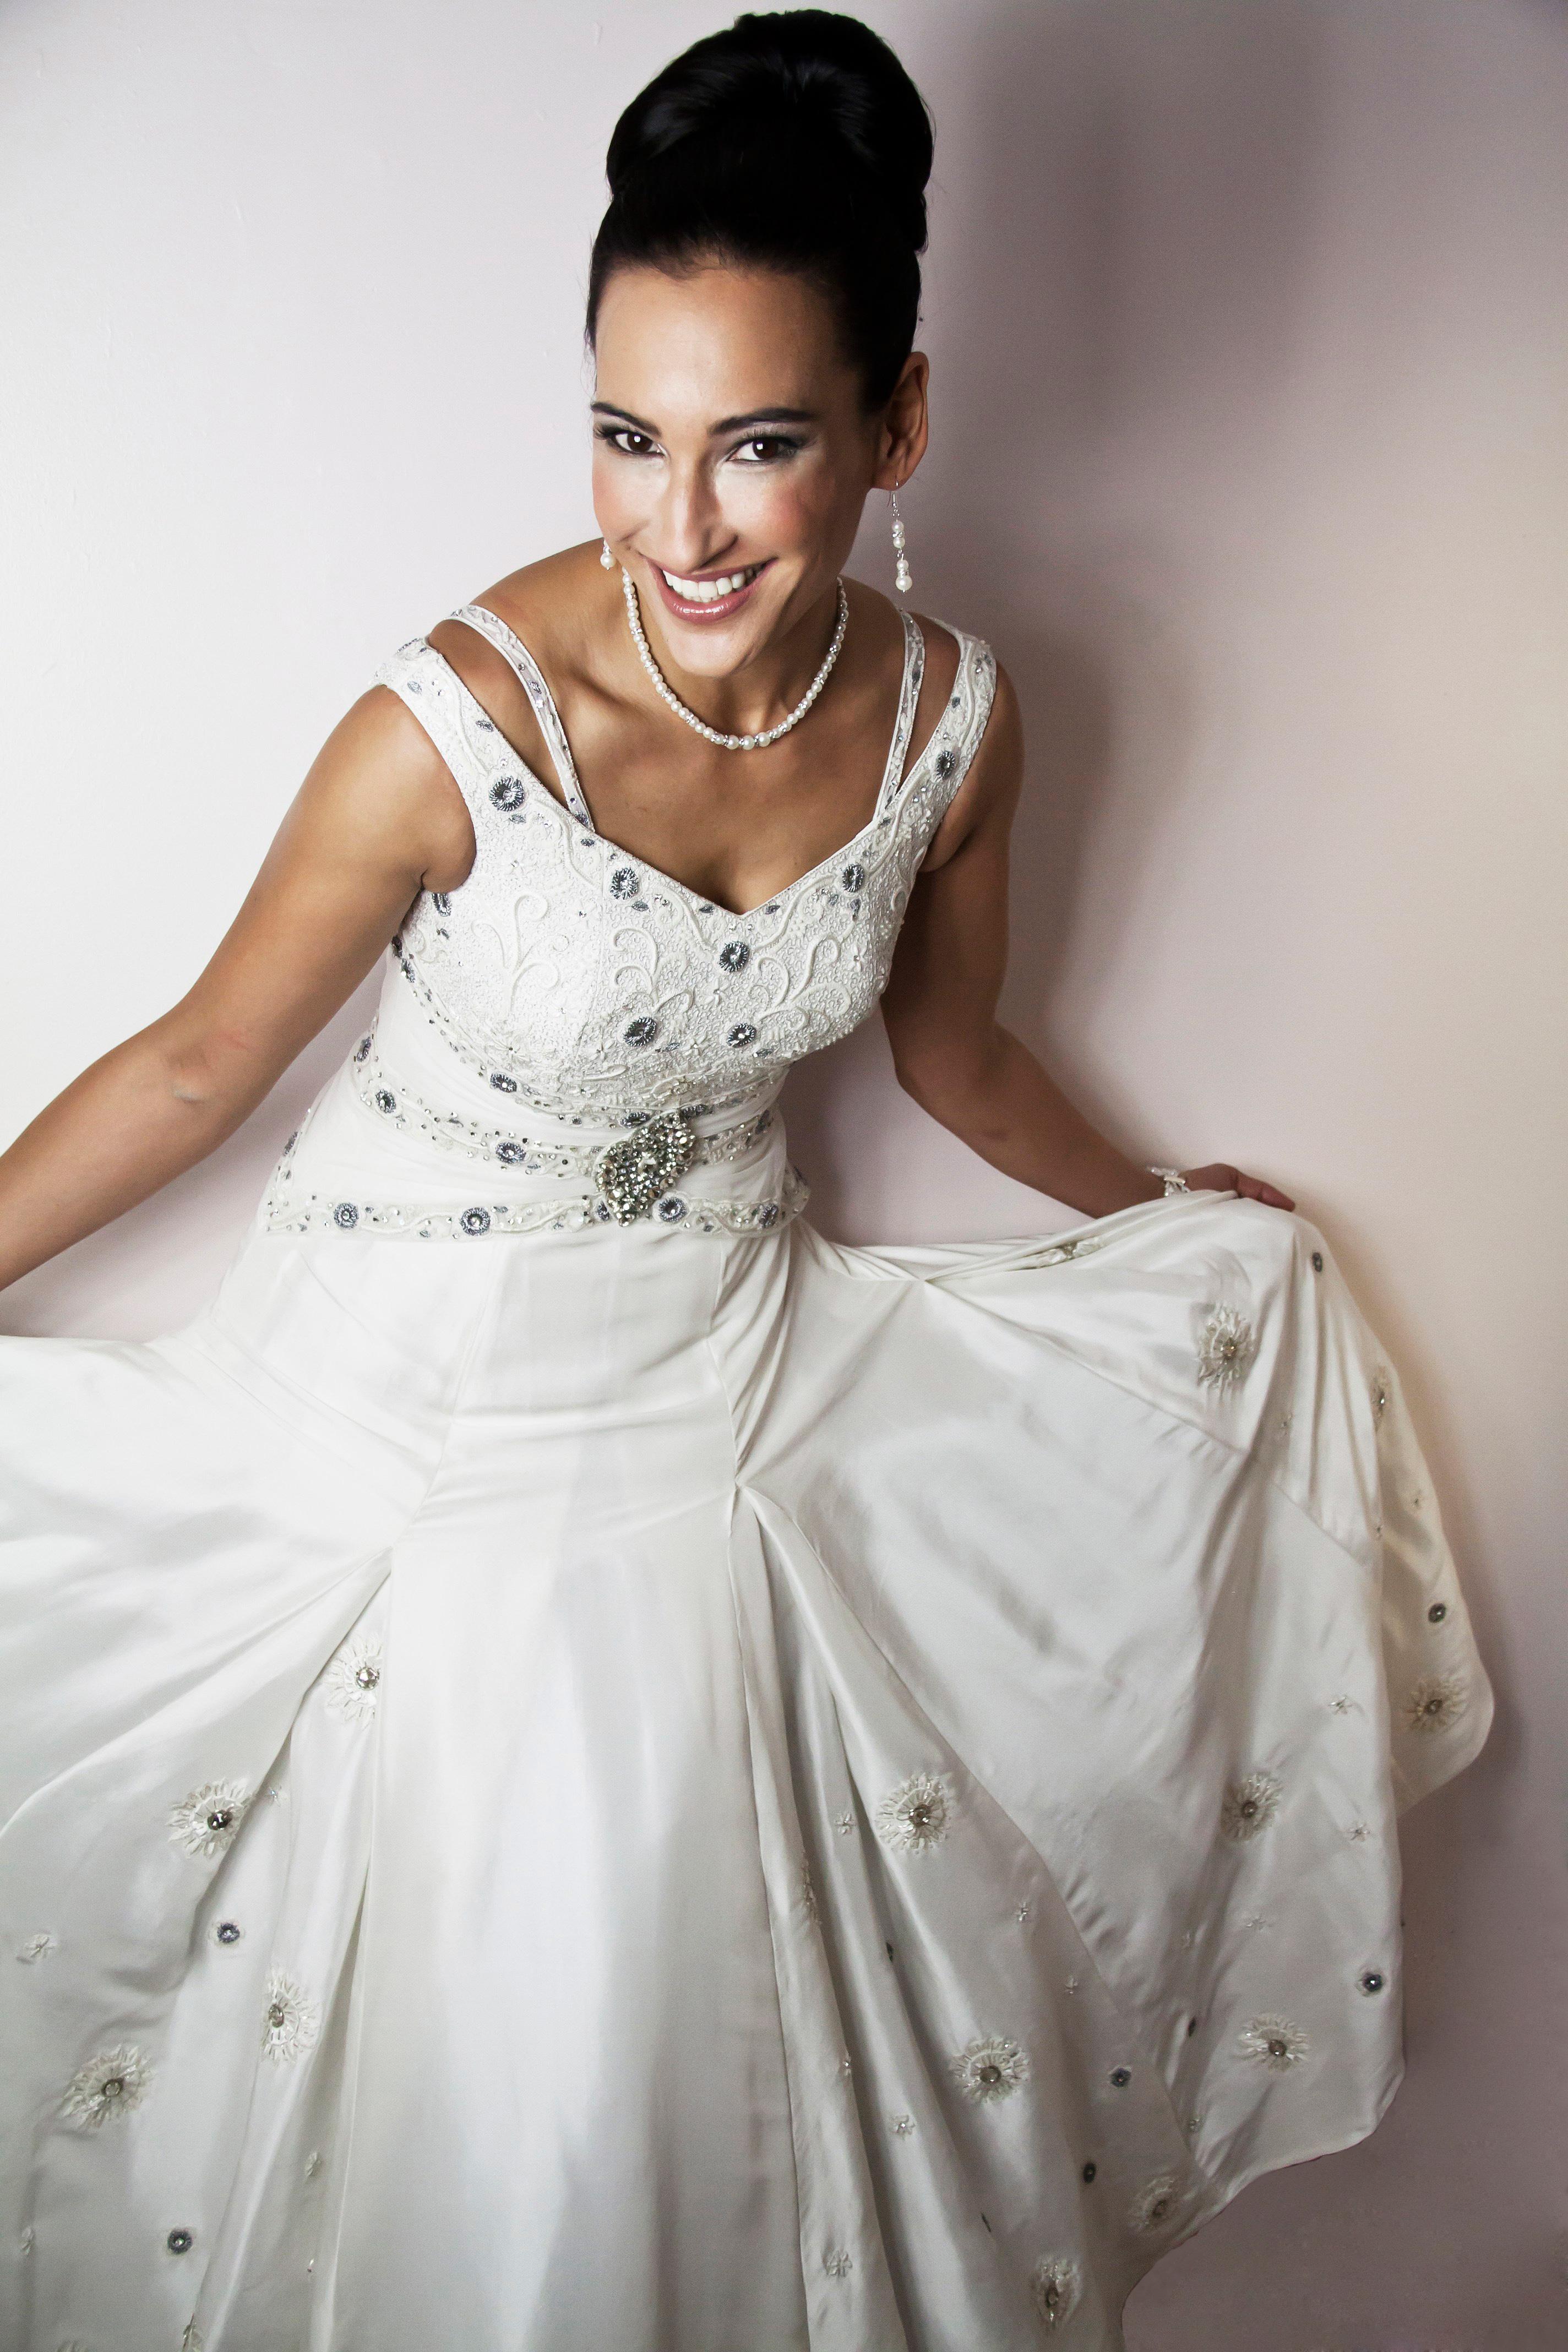 19_dress6_MG_3621